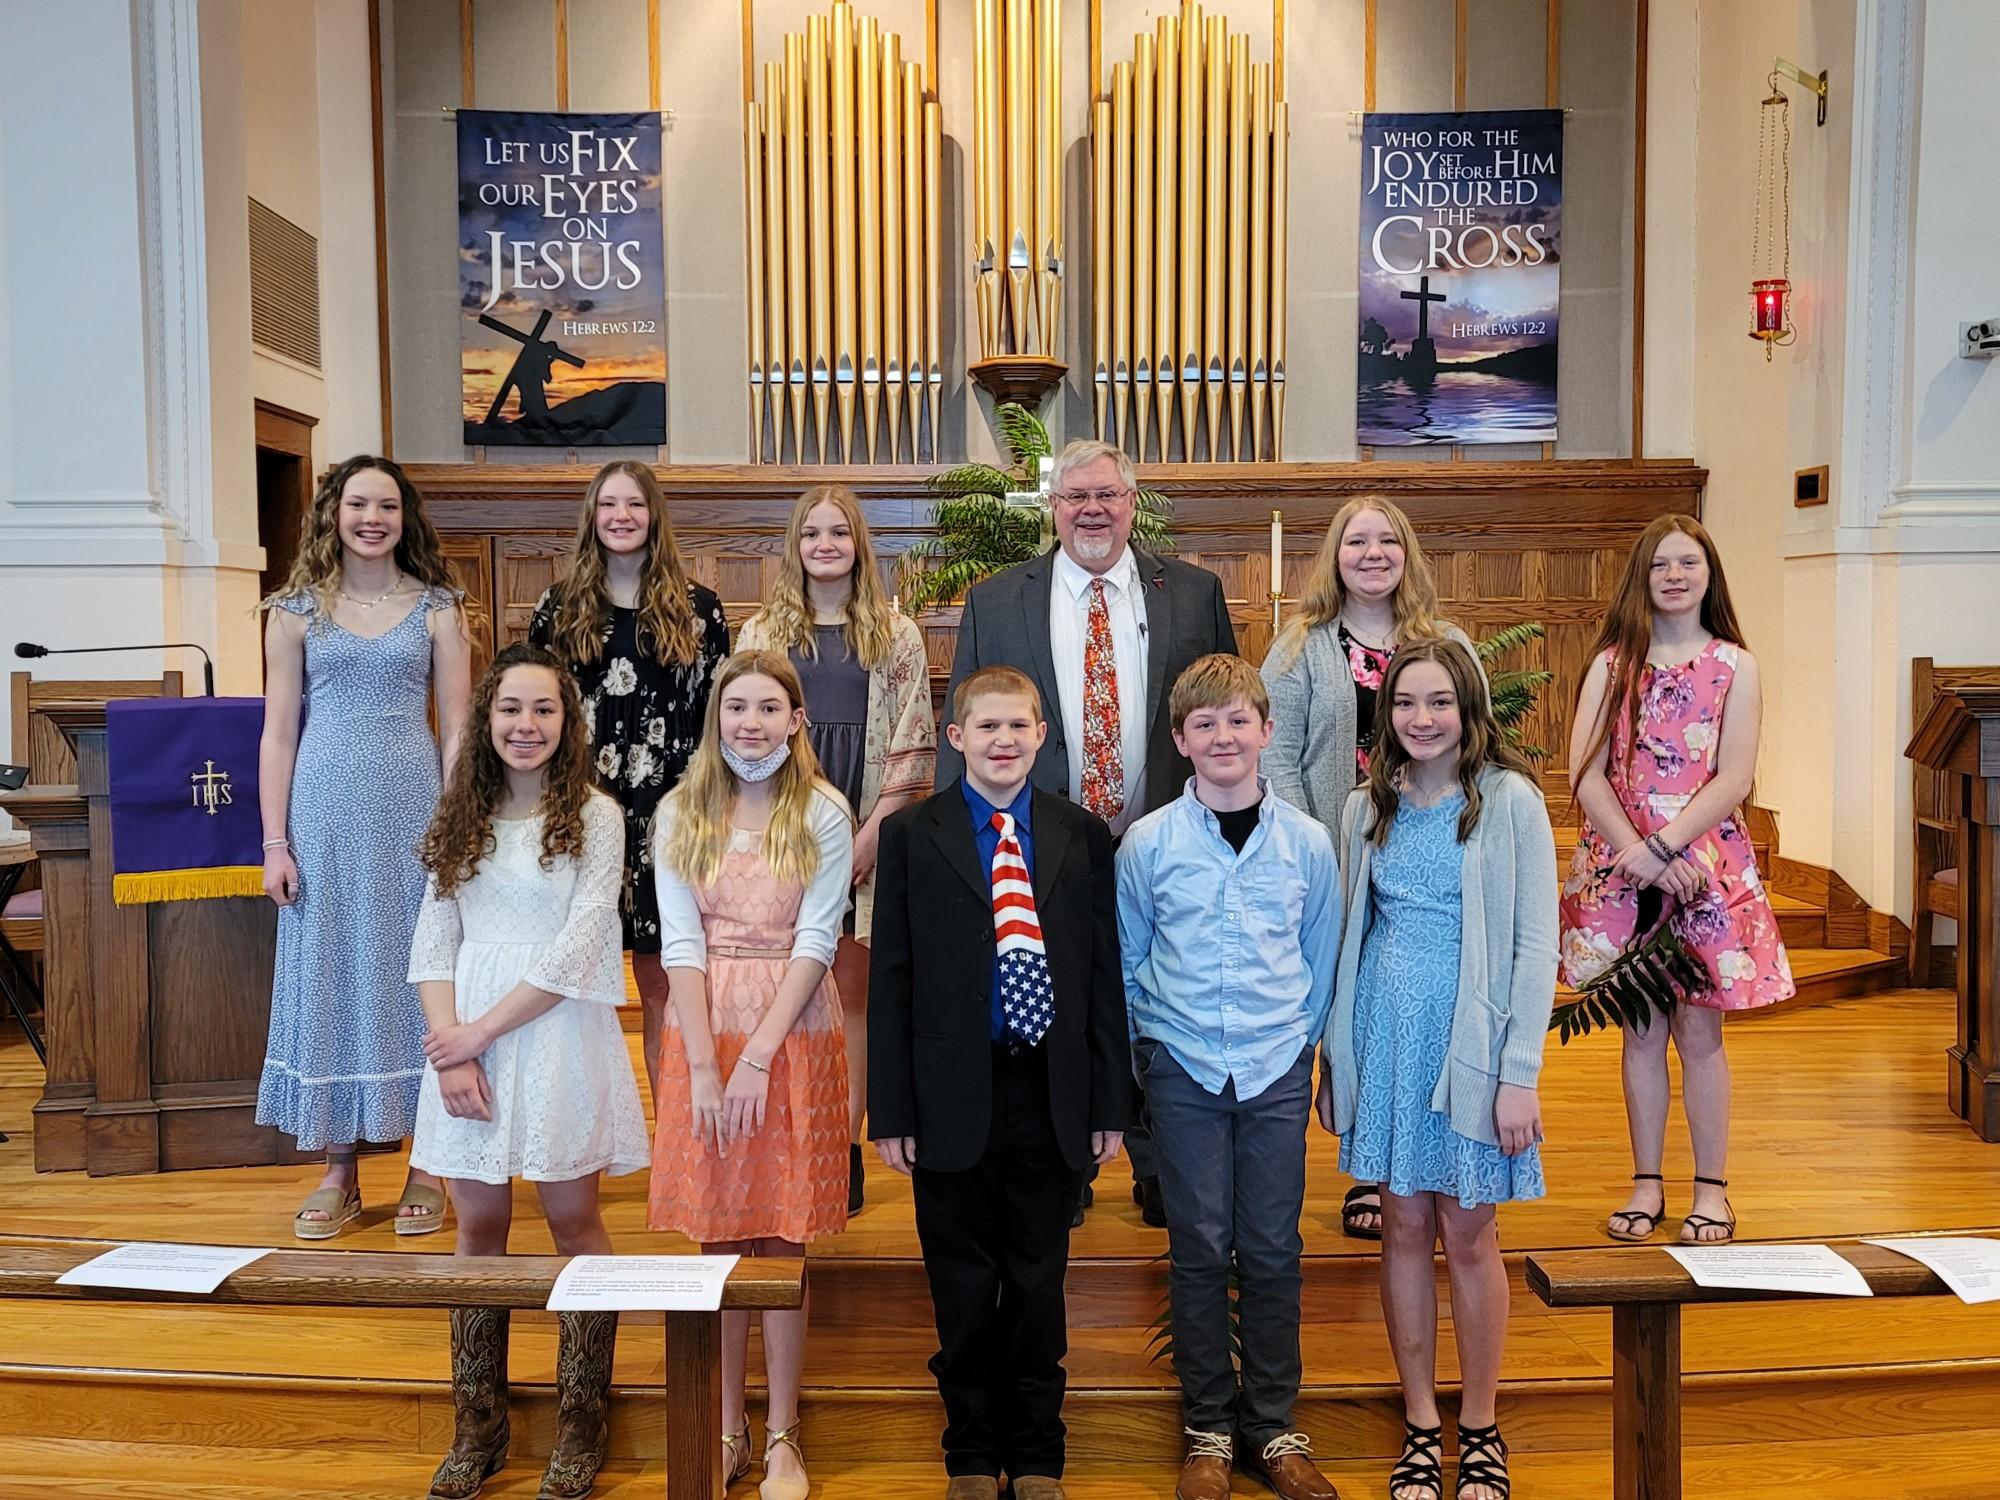 https://afum-media.s3.amazonaws.com/atlantic-first-united-methodist-church/images/afum-confirmation-pix.jpg